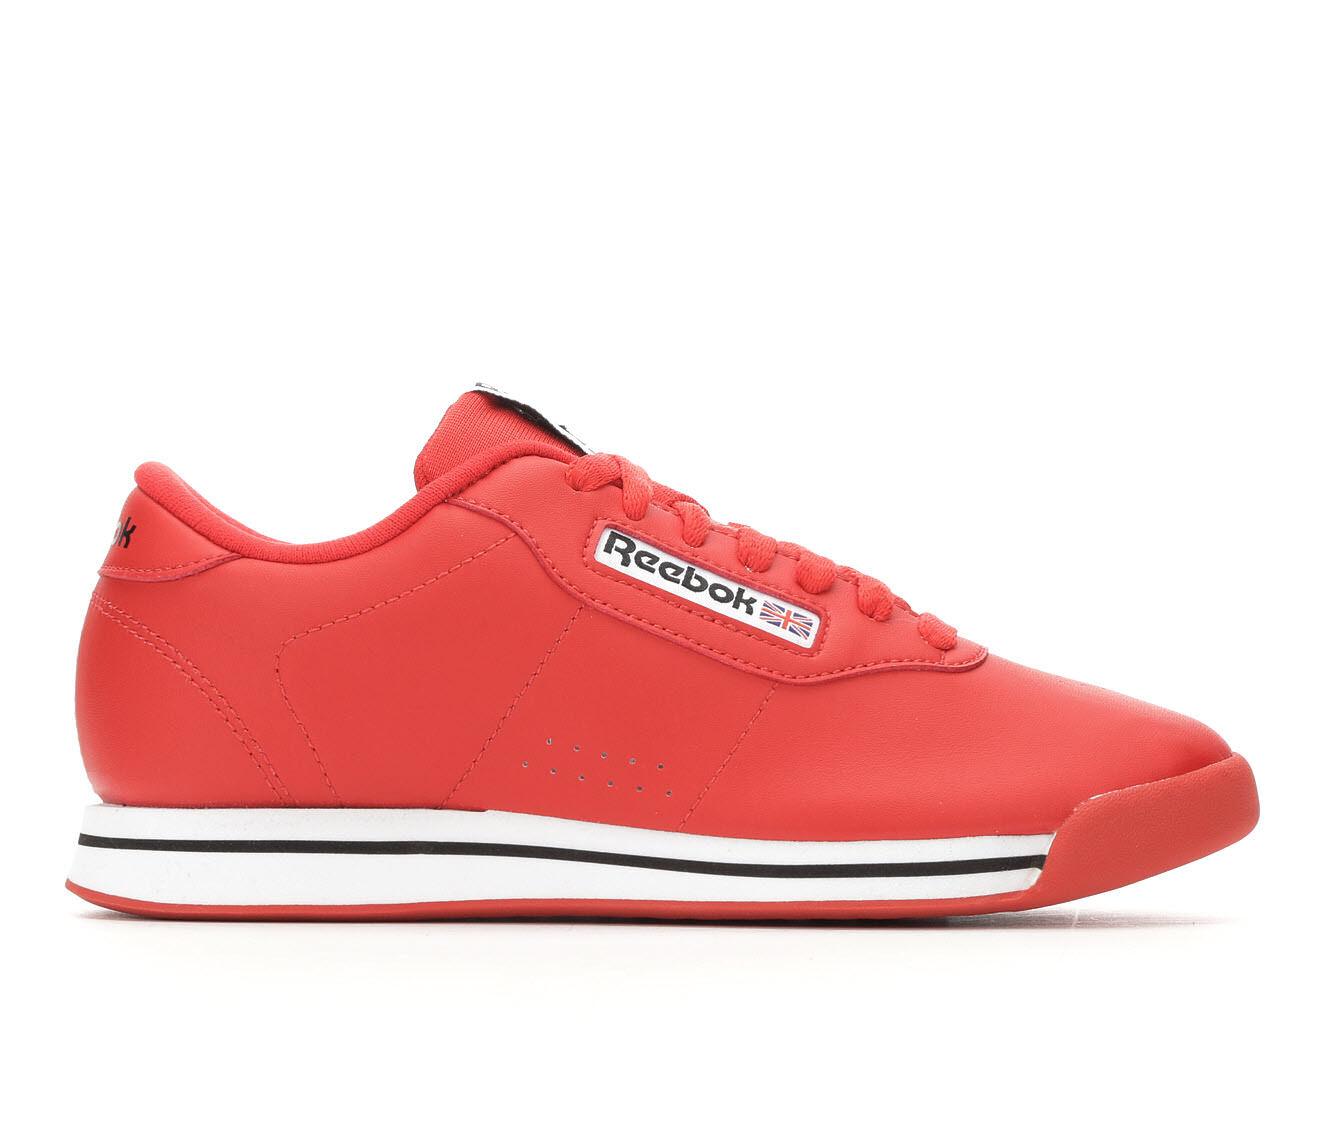 Women's Reebok Princess II Retro Sneakers Red/White/Black